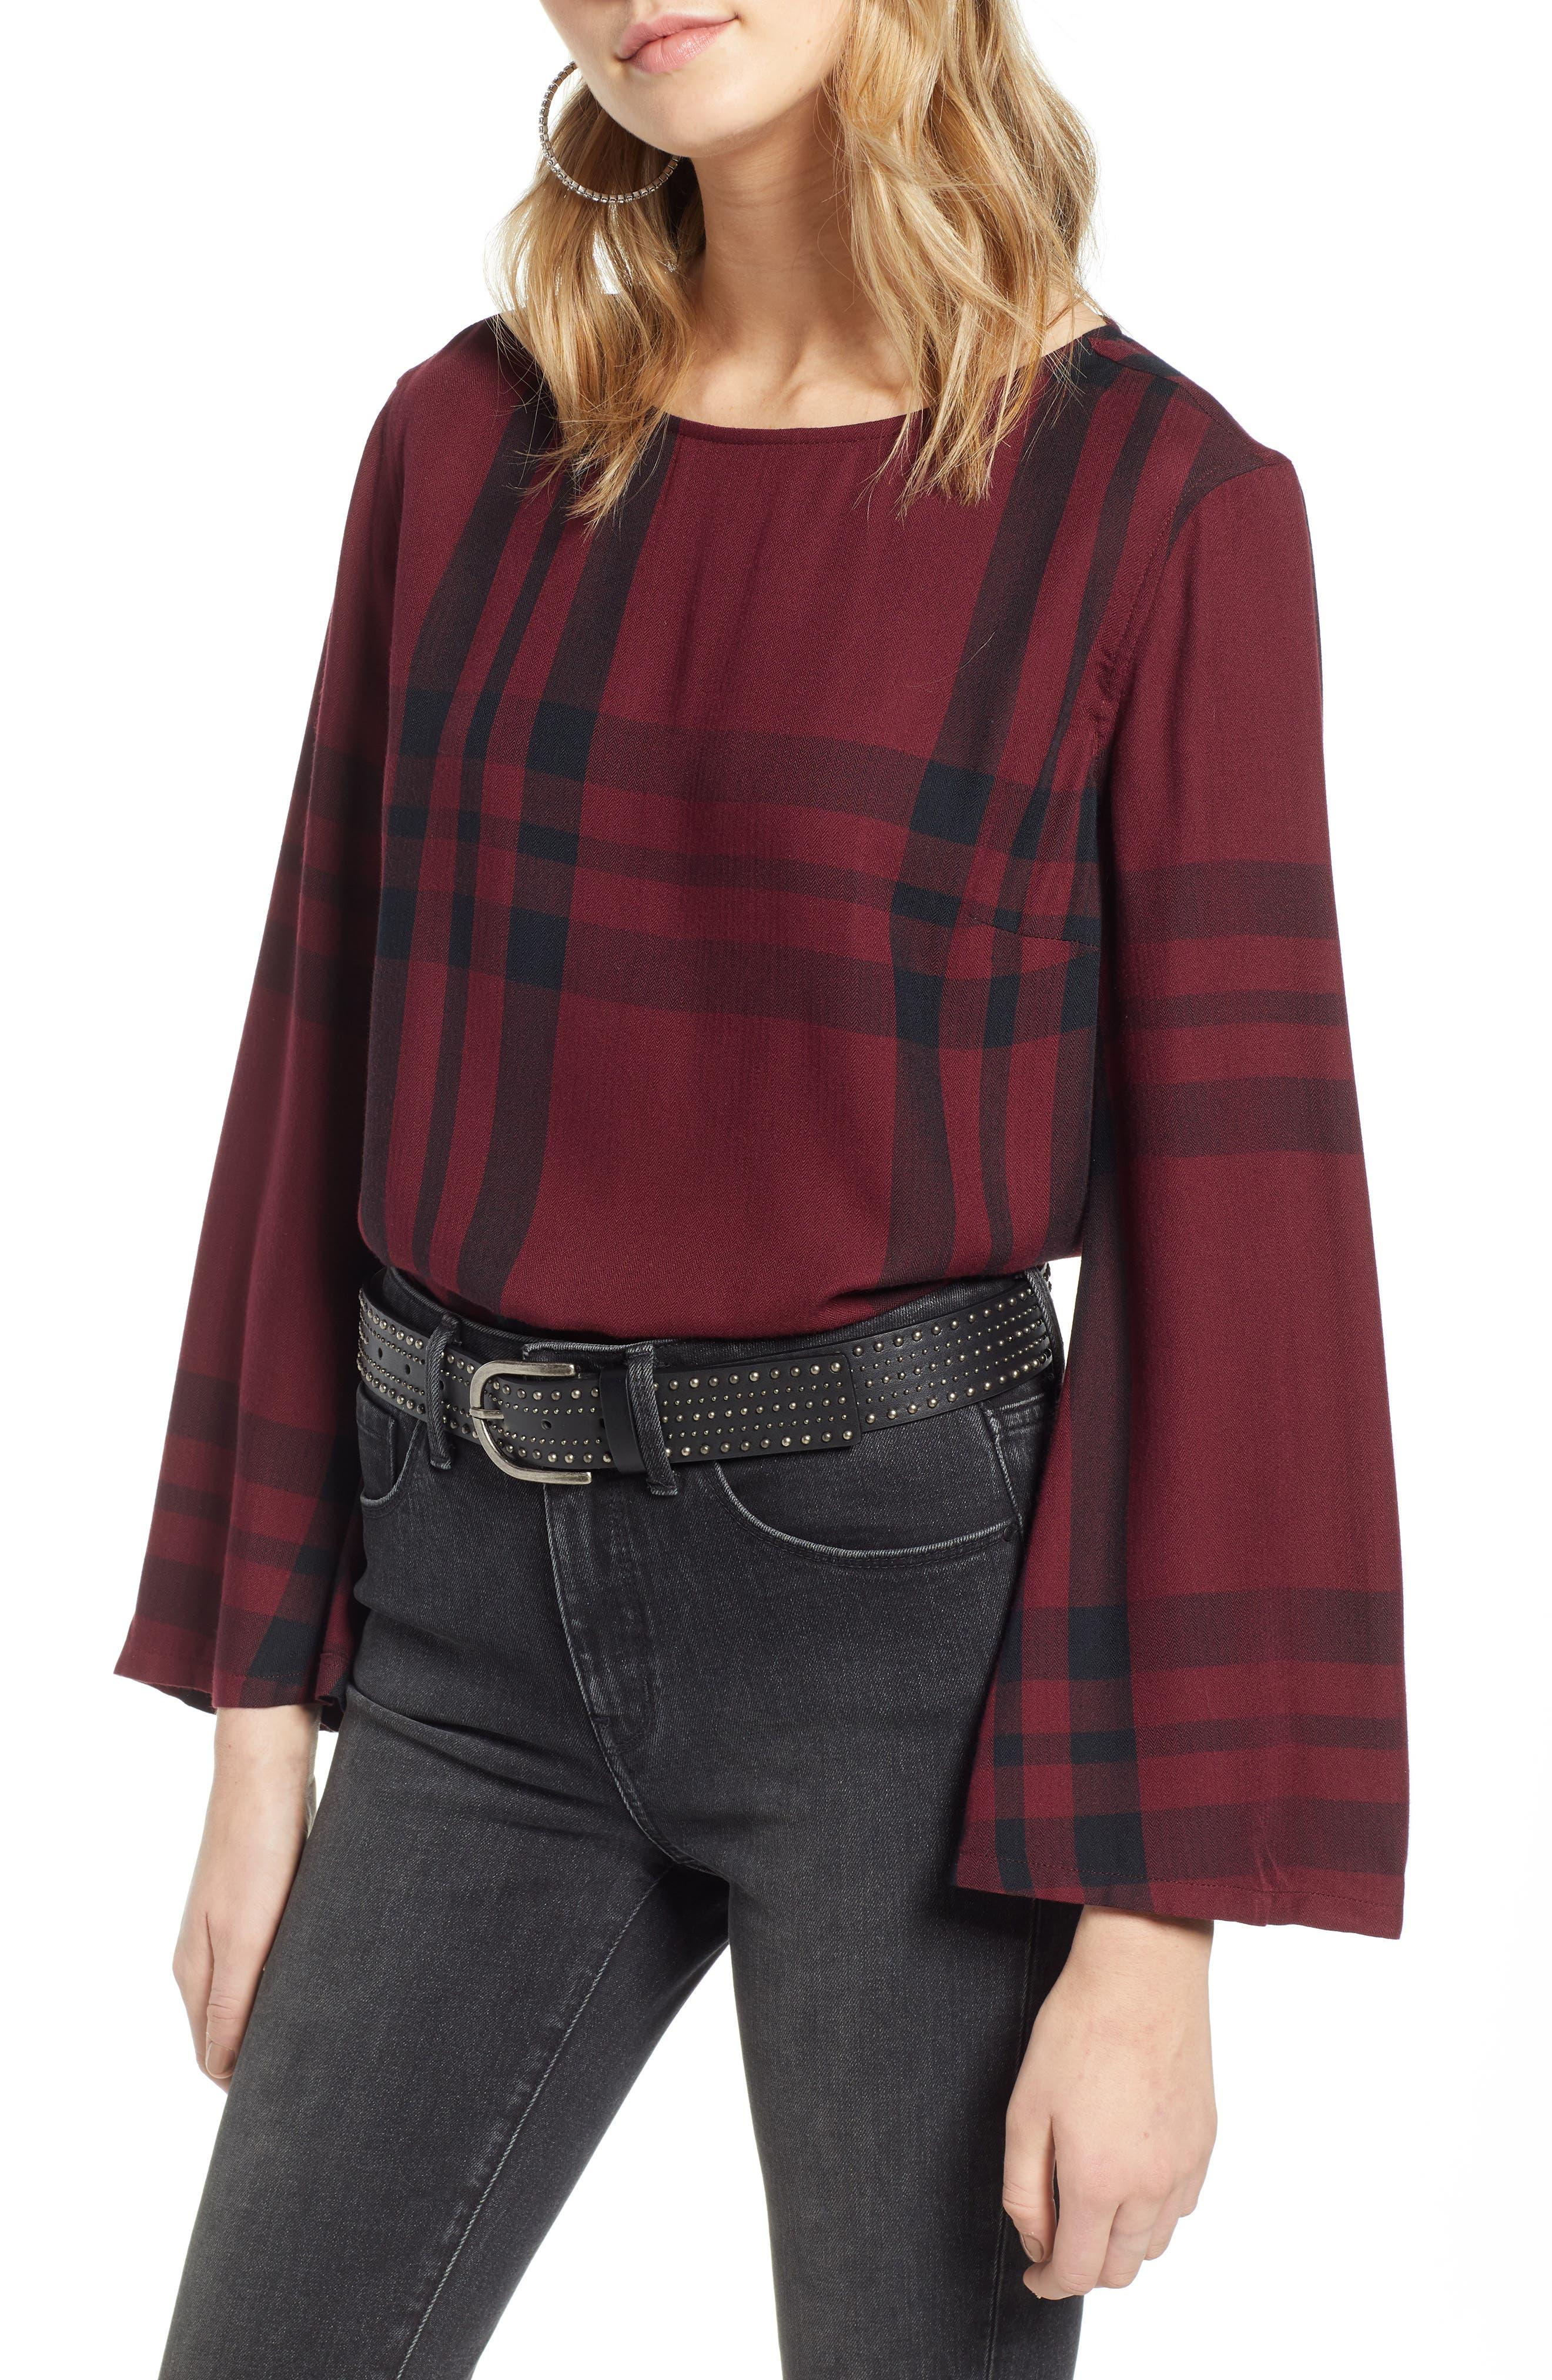 Bell Sleeve Shirt,                             Main thumbnail 1, color,                             RED TANNIN BULLSEYE PLAID